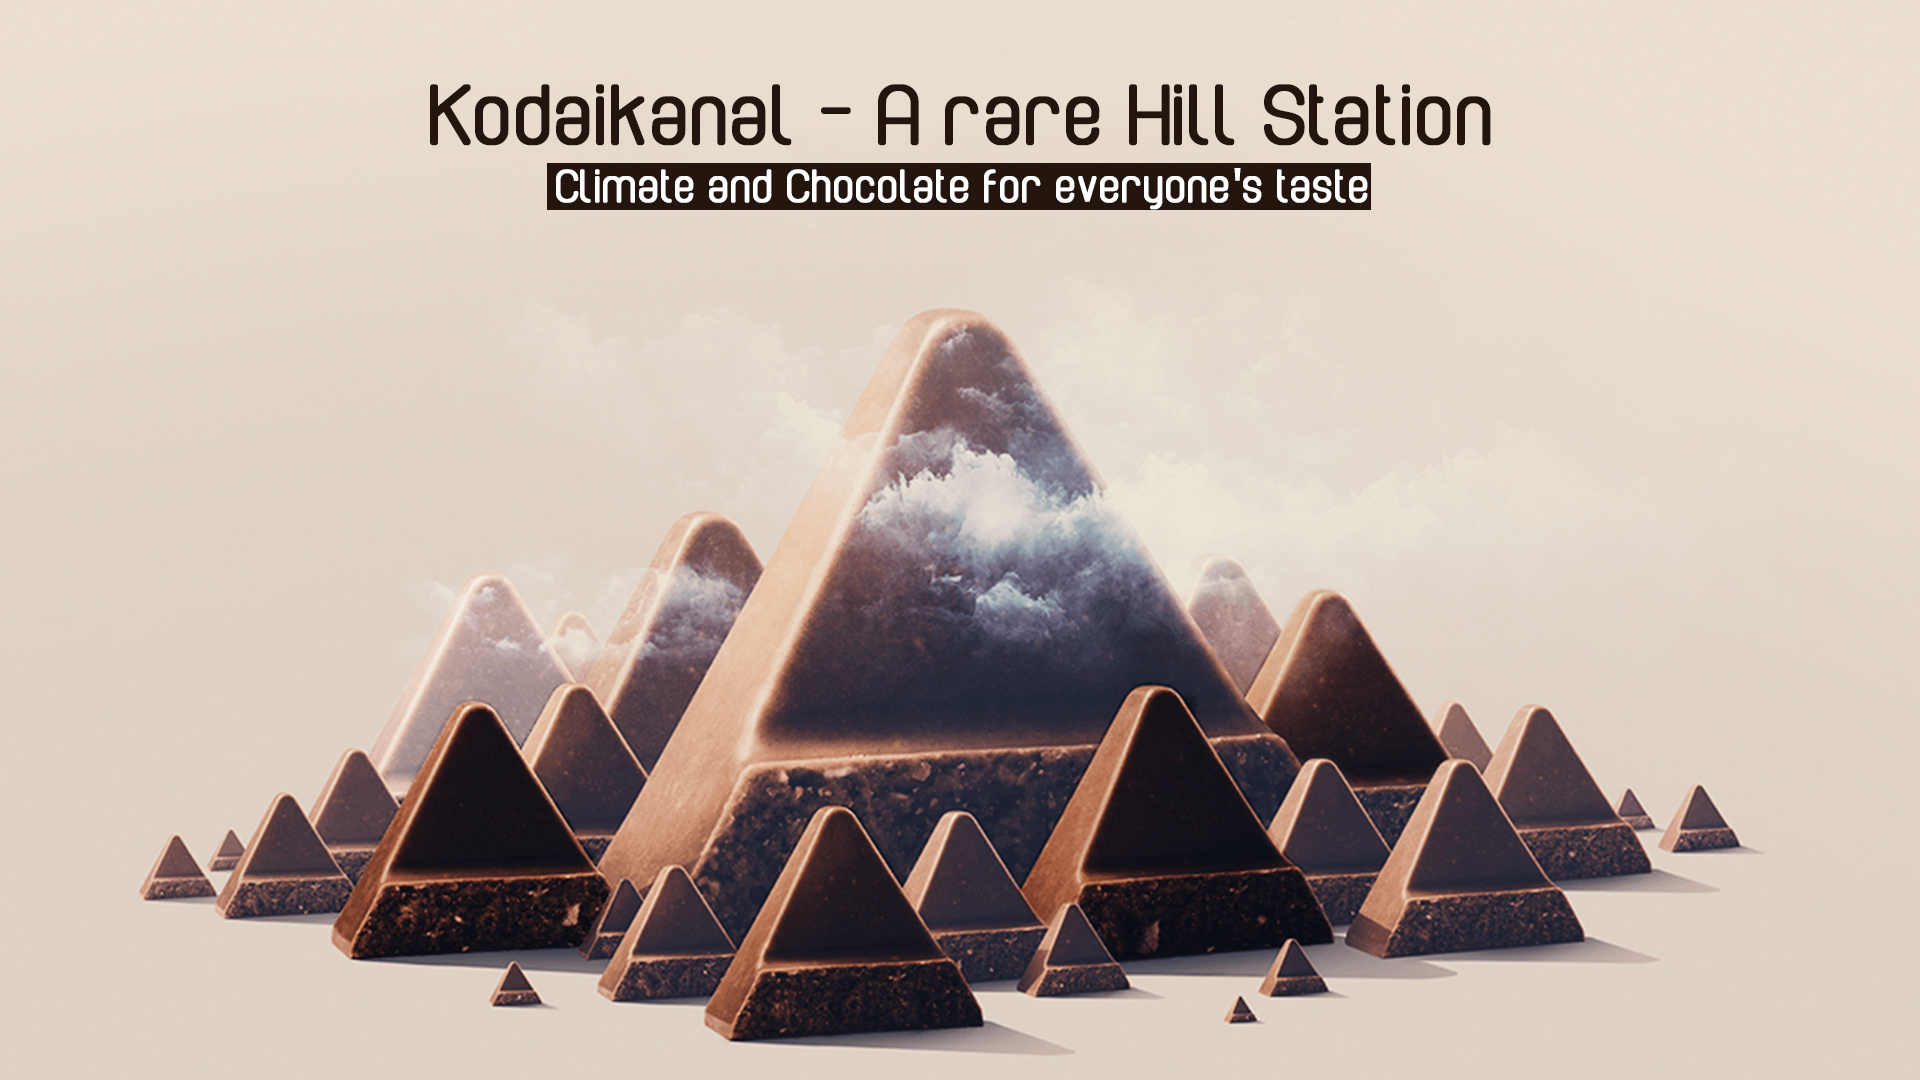 Kodaikanal – A rare Hill Station